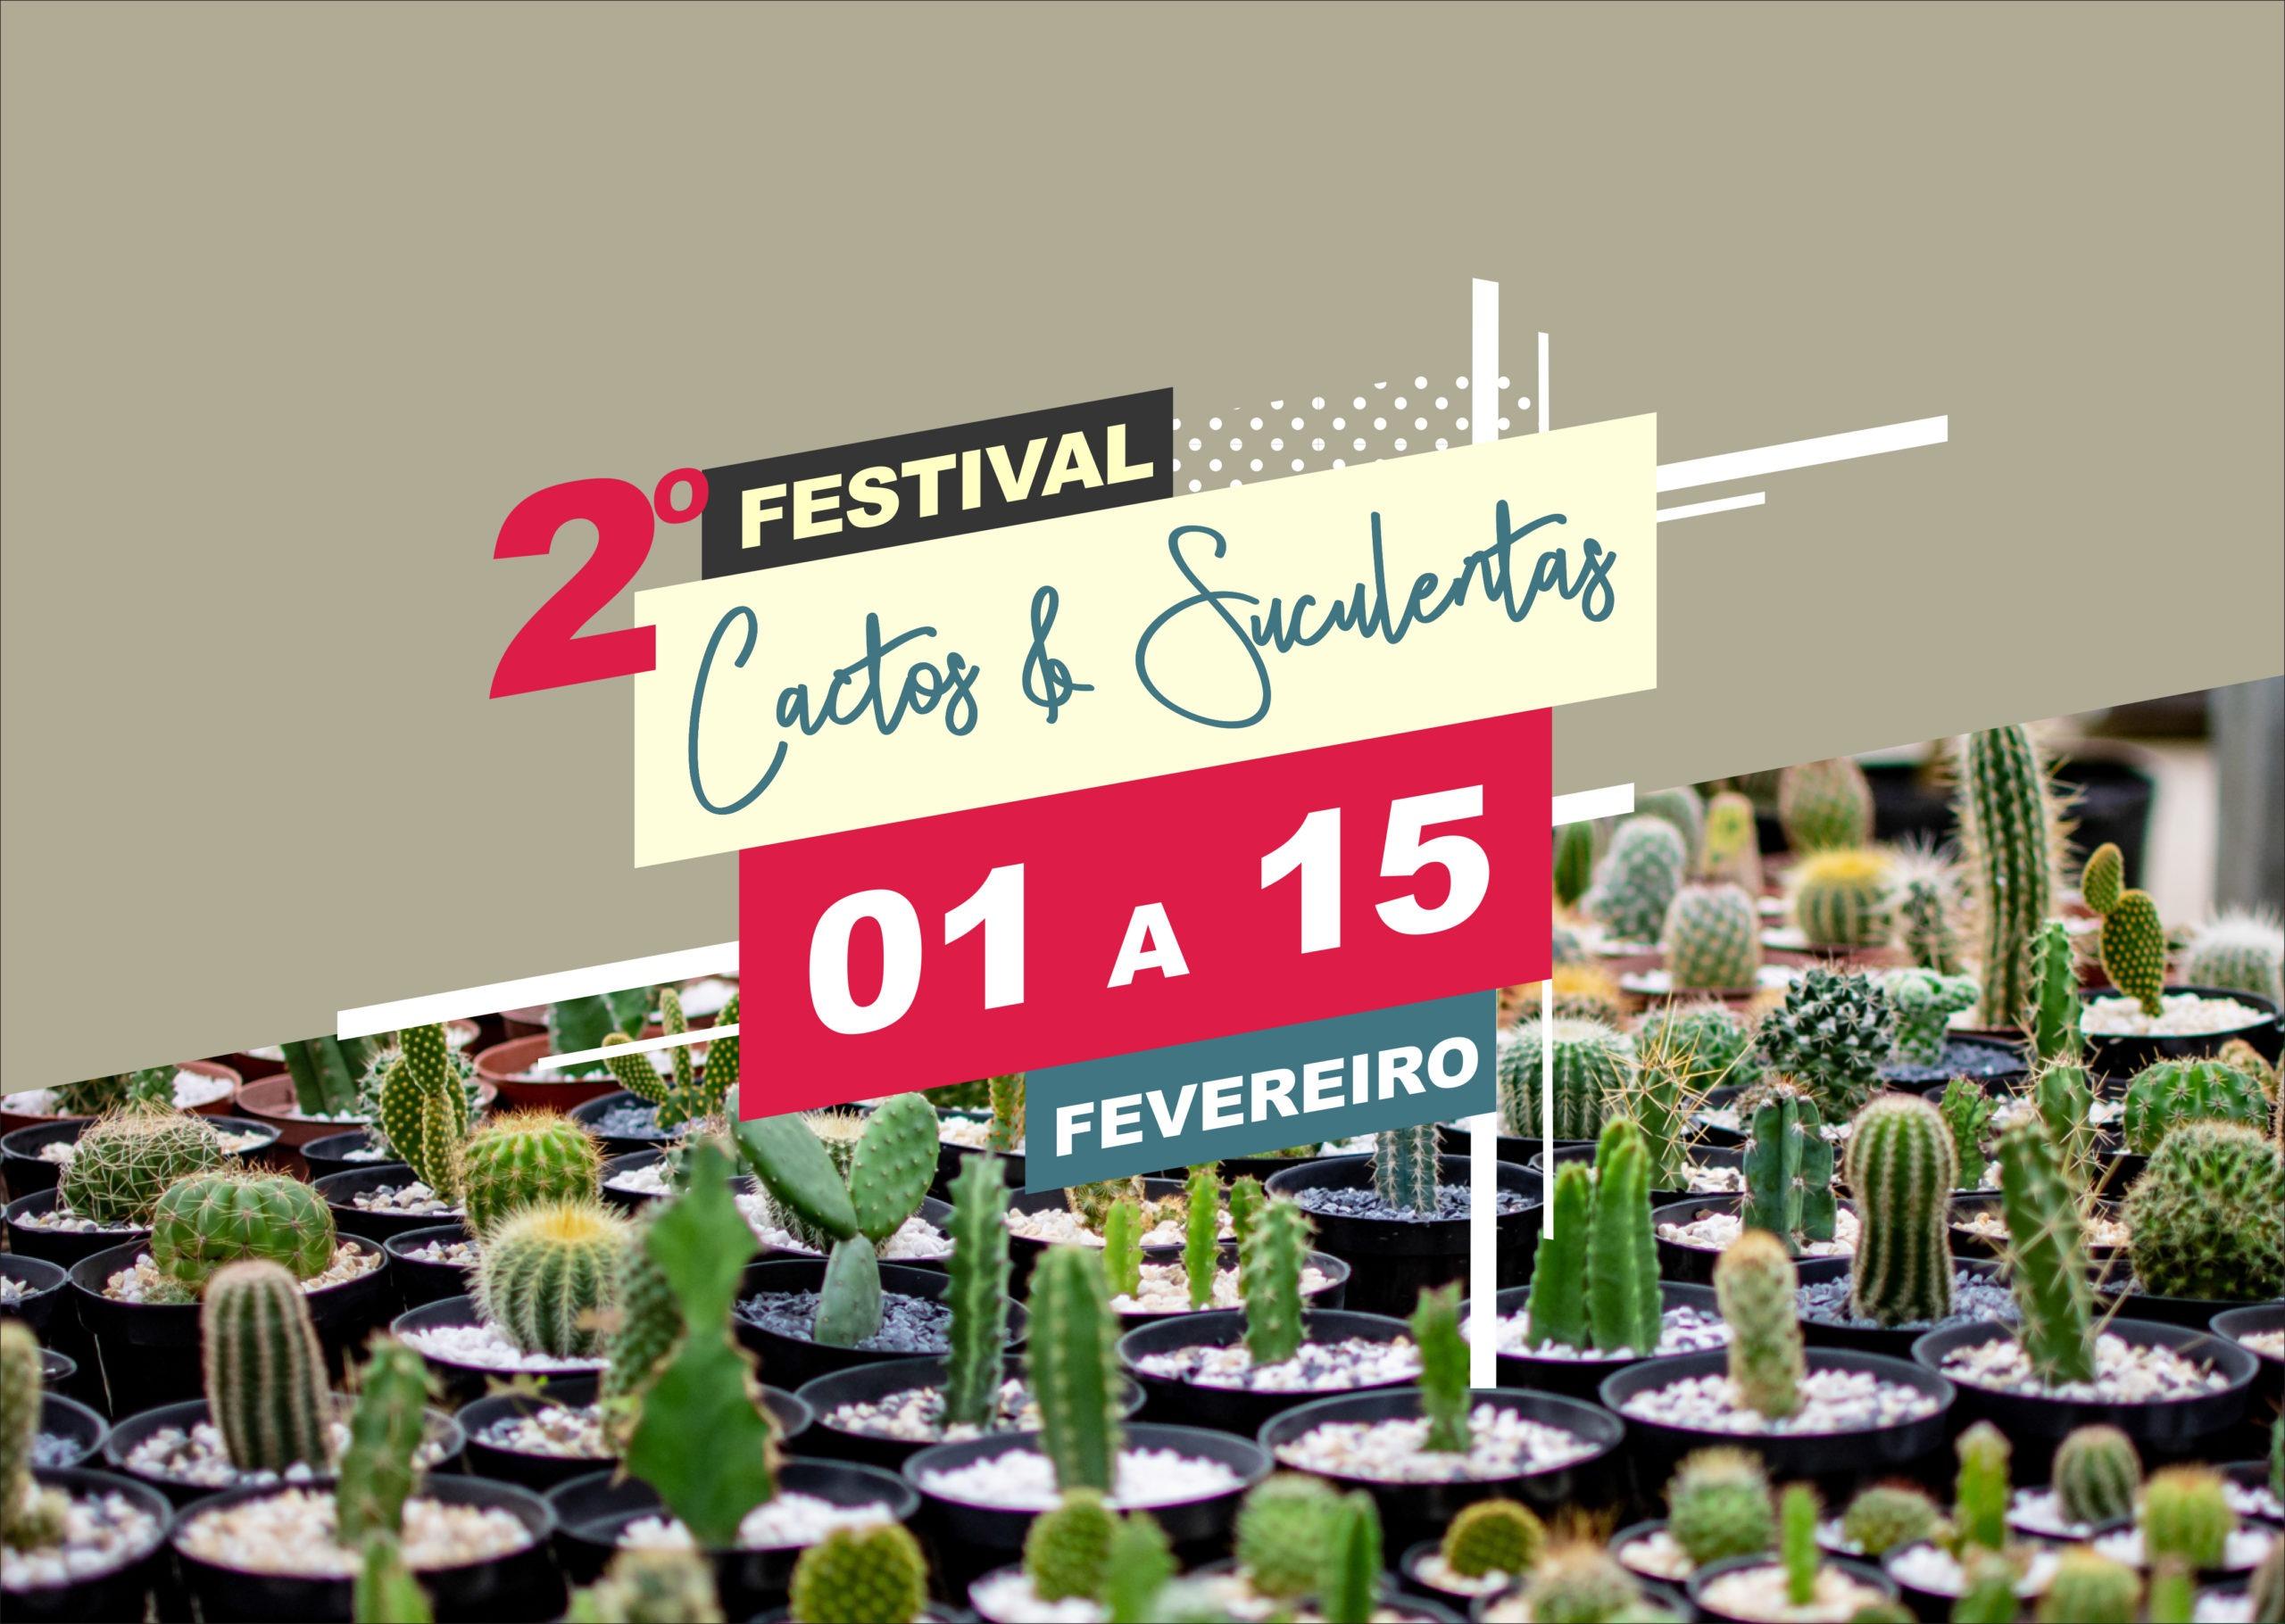 Festival de Cactos e Suculentas